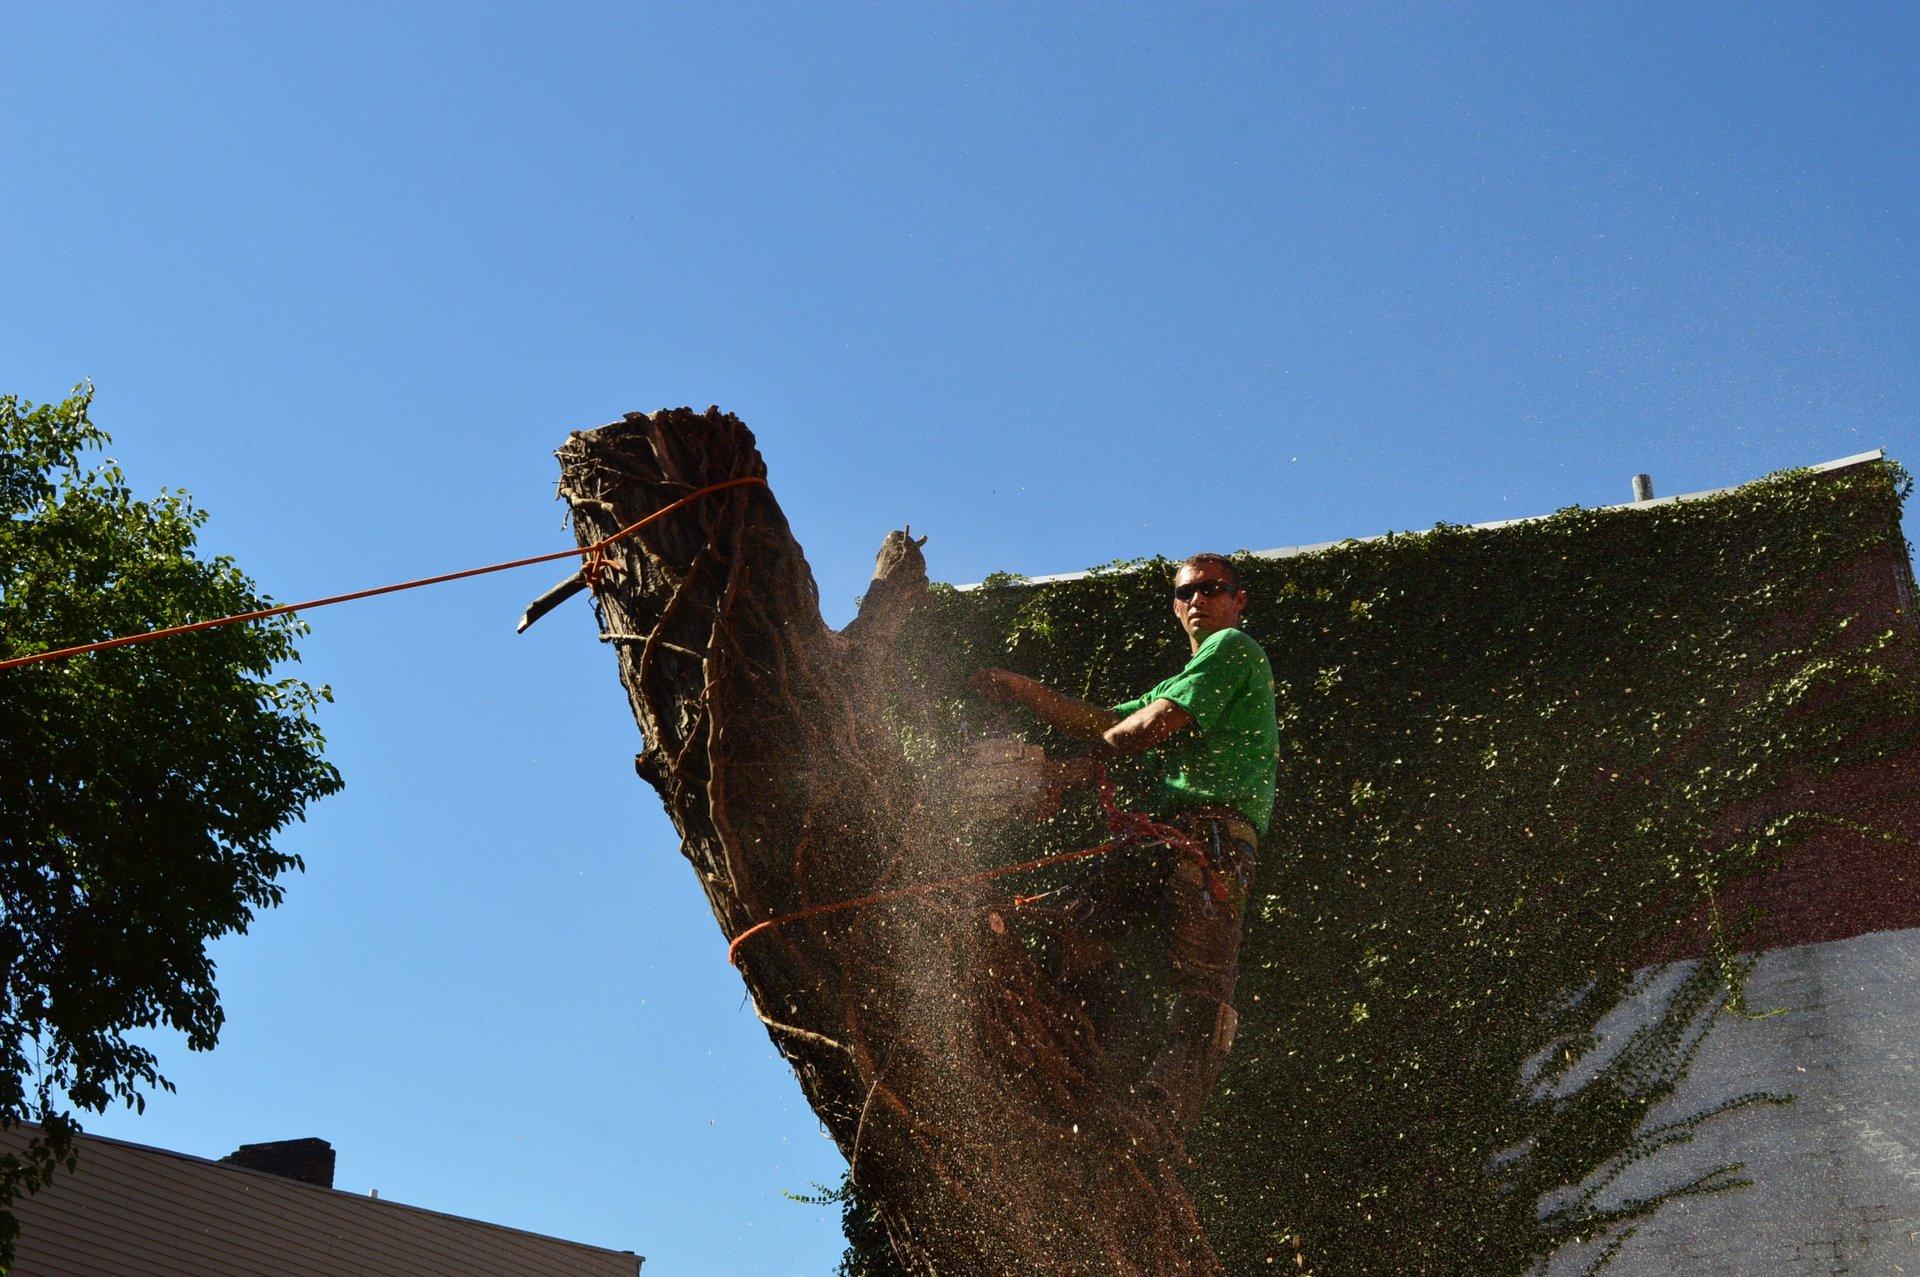 Peru's Tree Service Inc. image 7